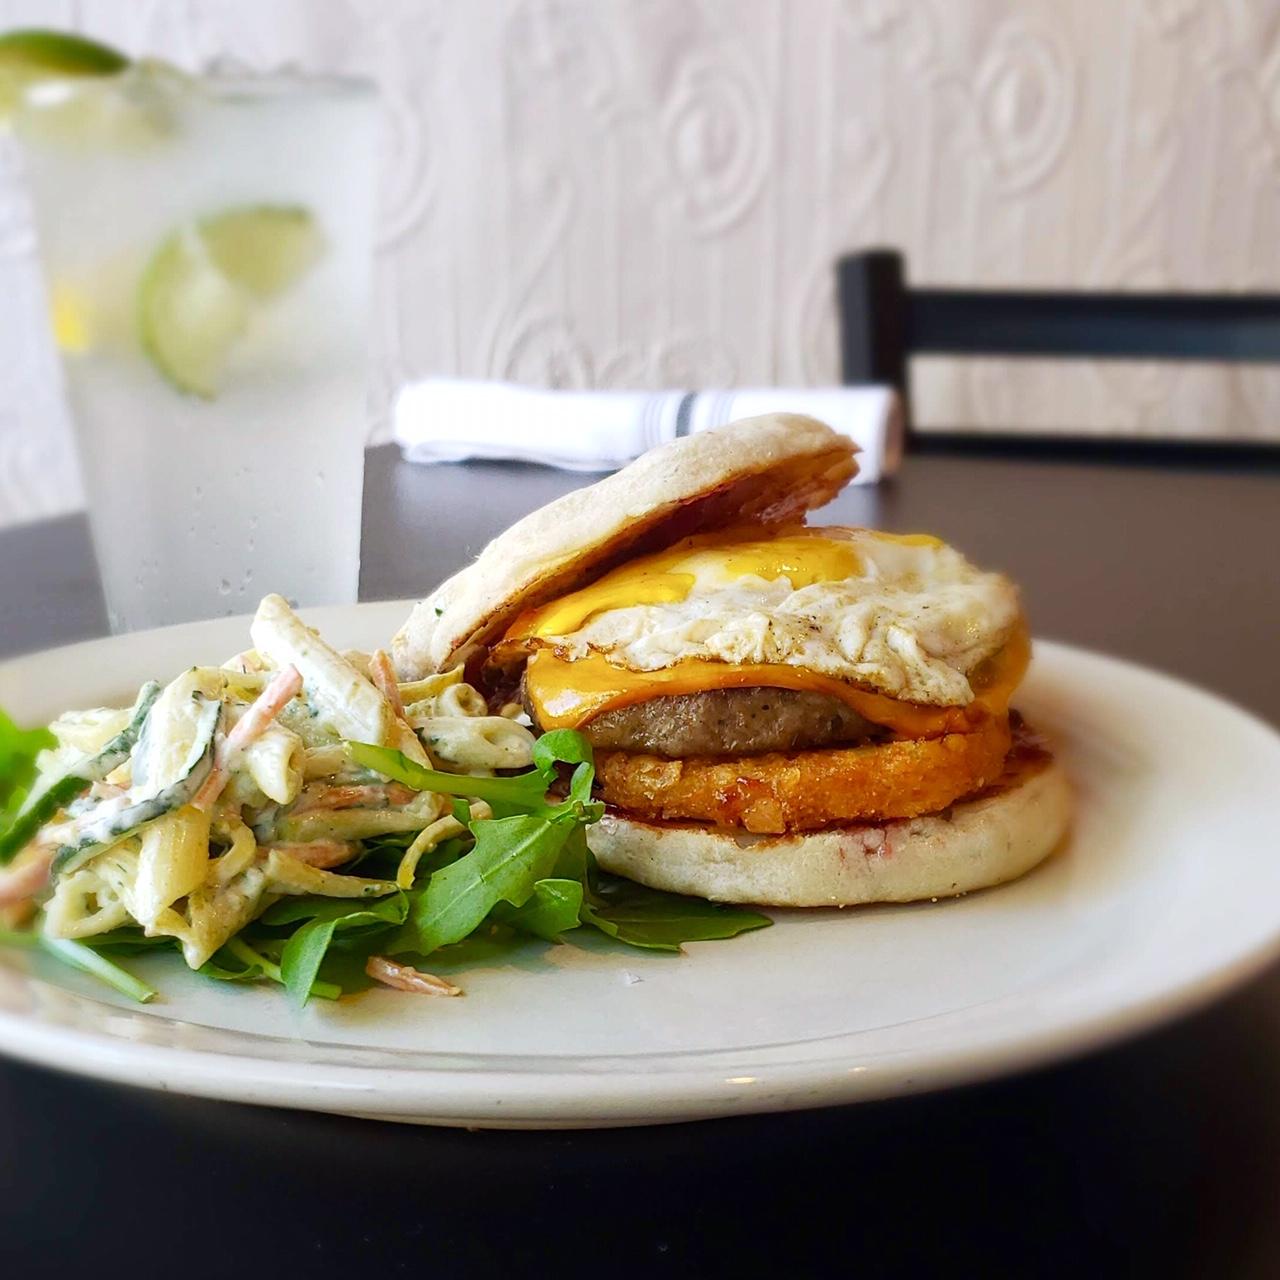 sandwich-lunch-holland-waverly-stone